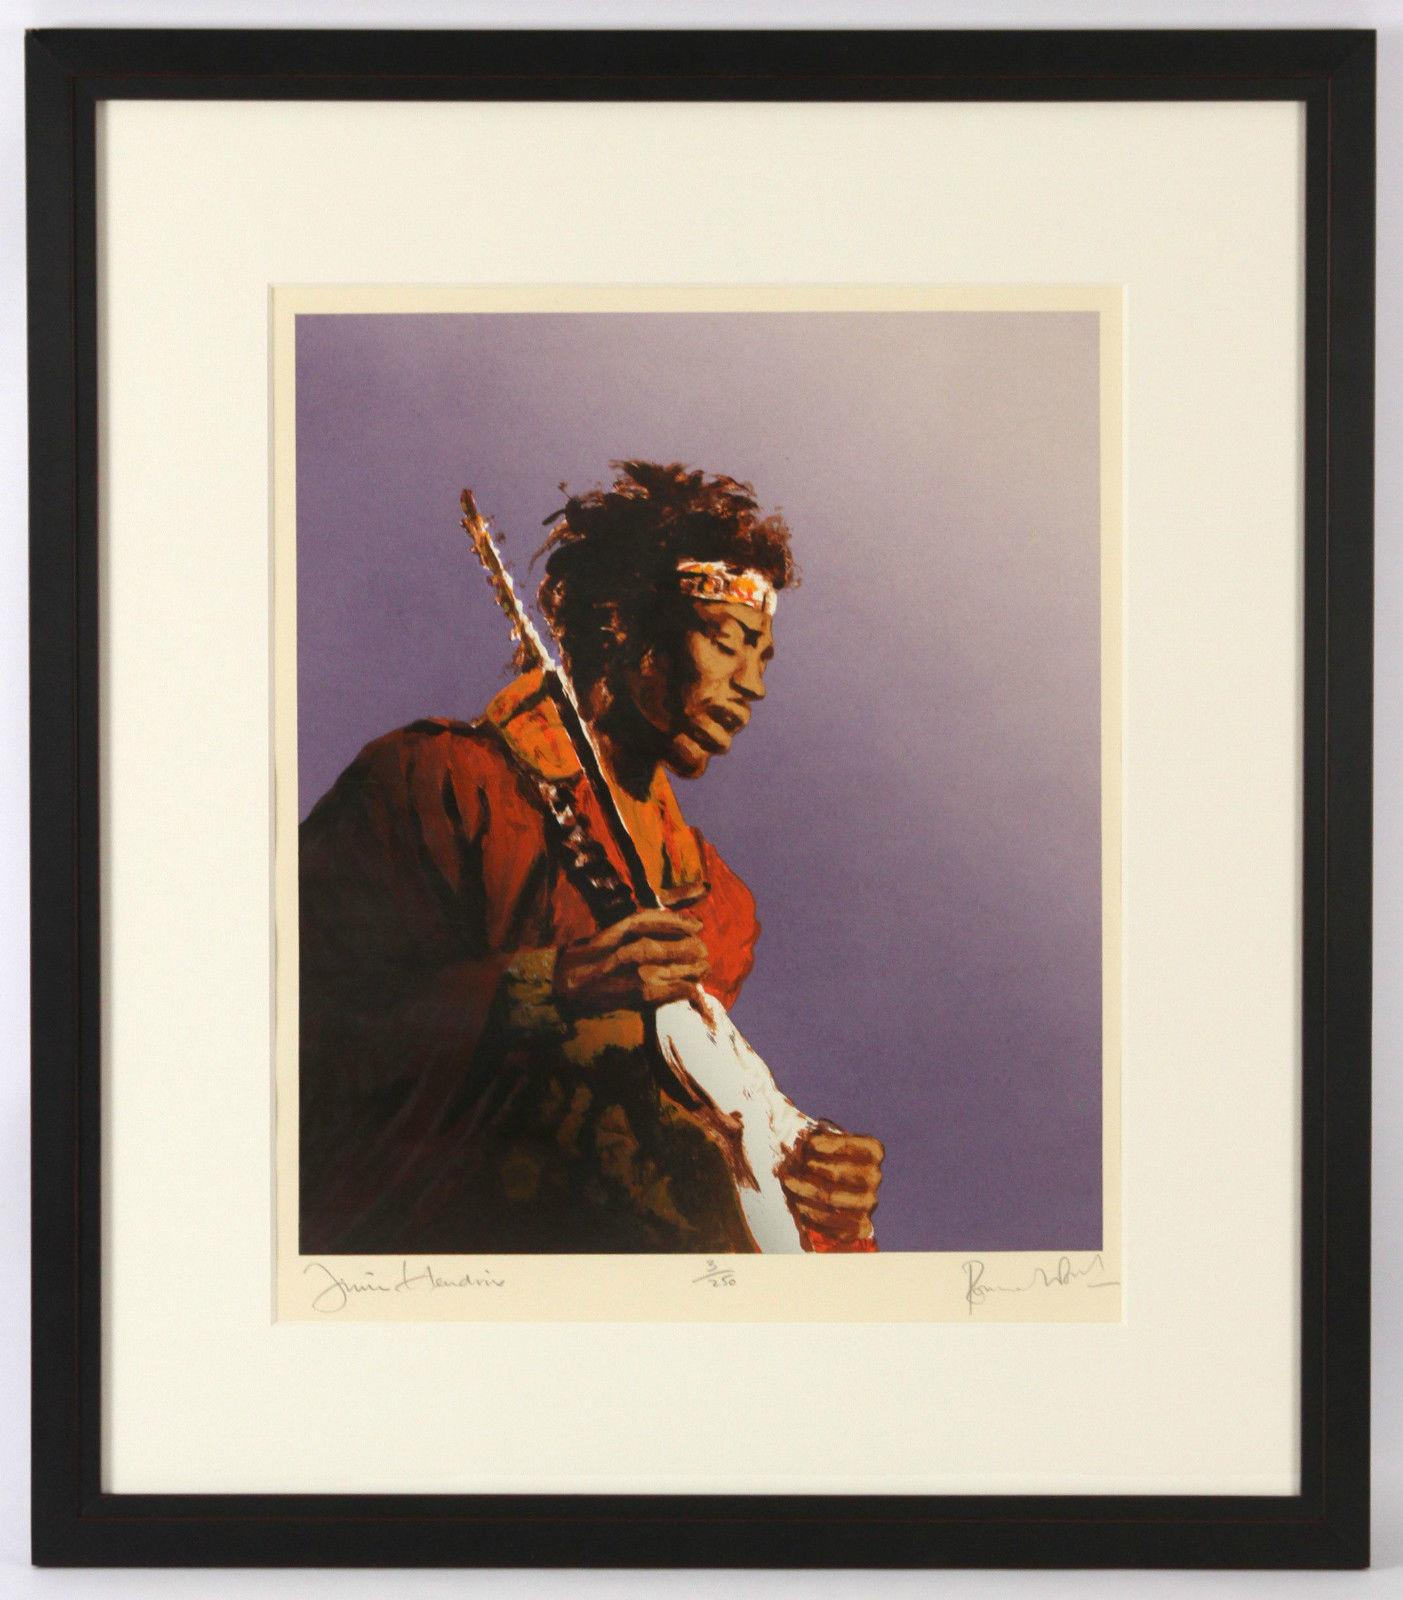 1991 Ronnie Wood, Rolling Stones, Jimi Hendrix, LE Screenprint on Somerset Paper